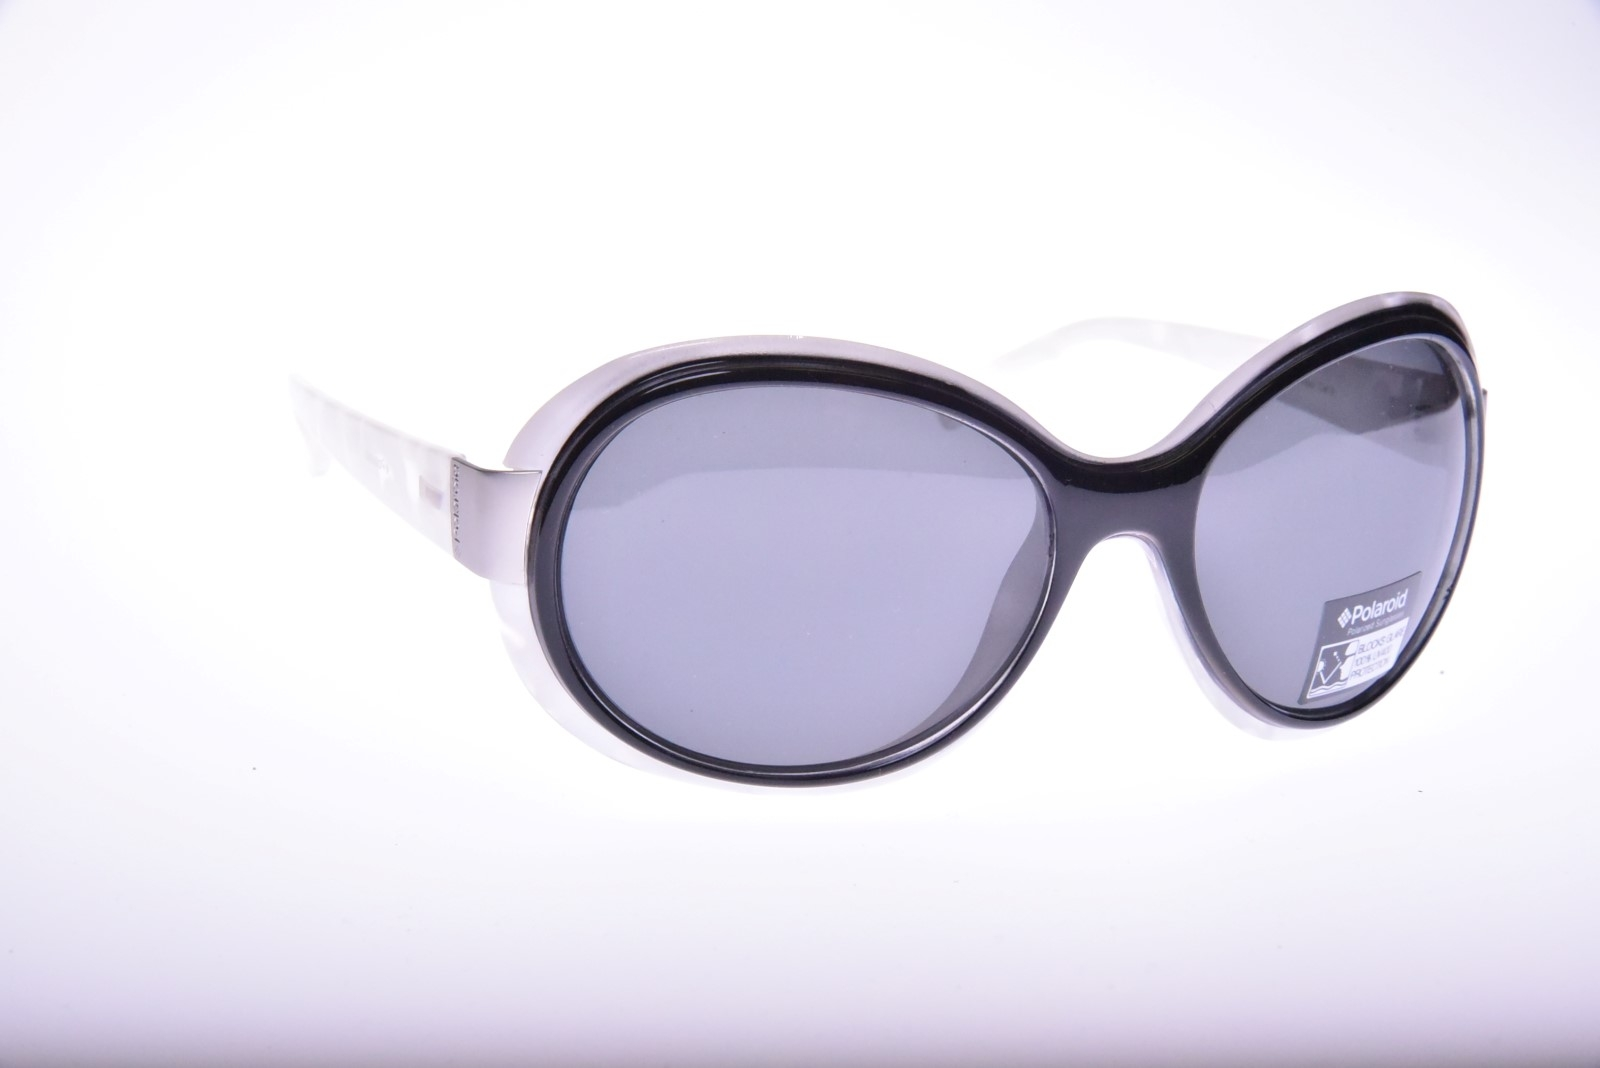 Polaroid Superior F8014C - Dámske slnečné okuliare 710f8037dbe